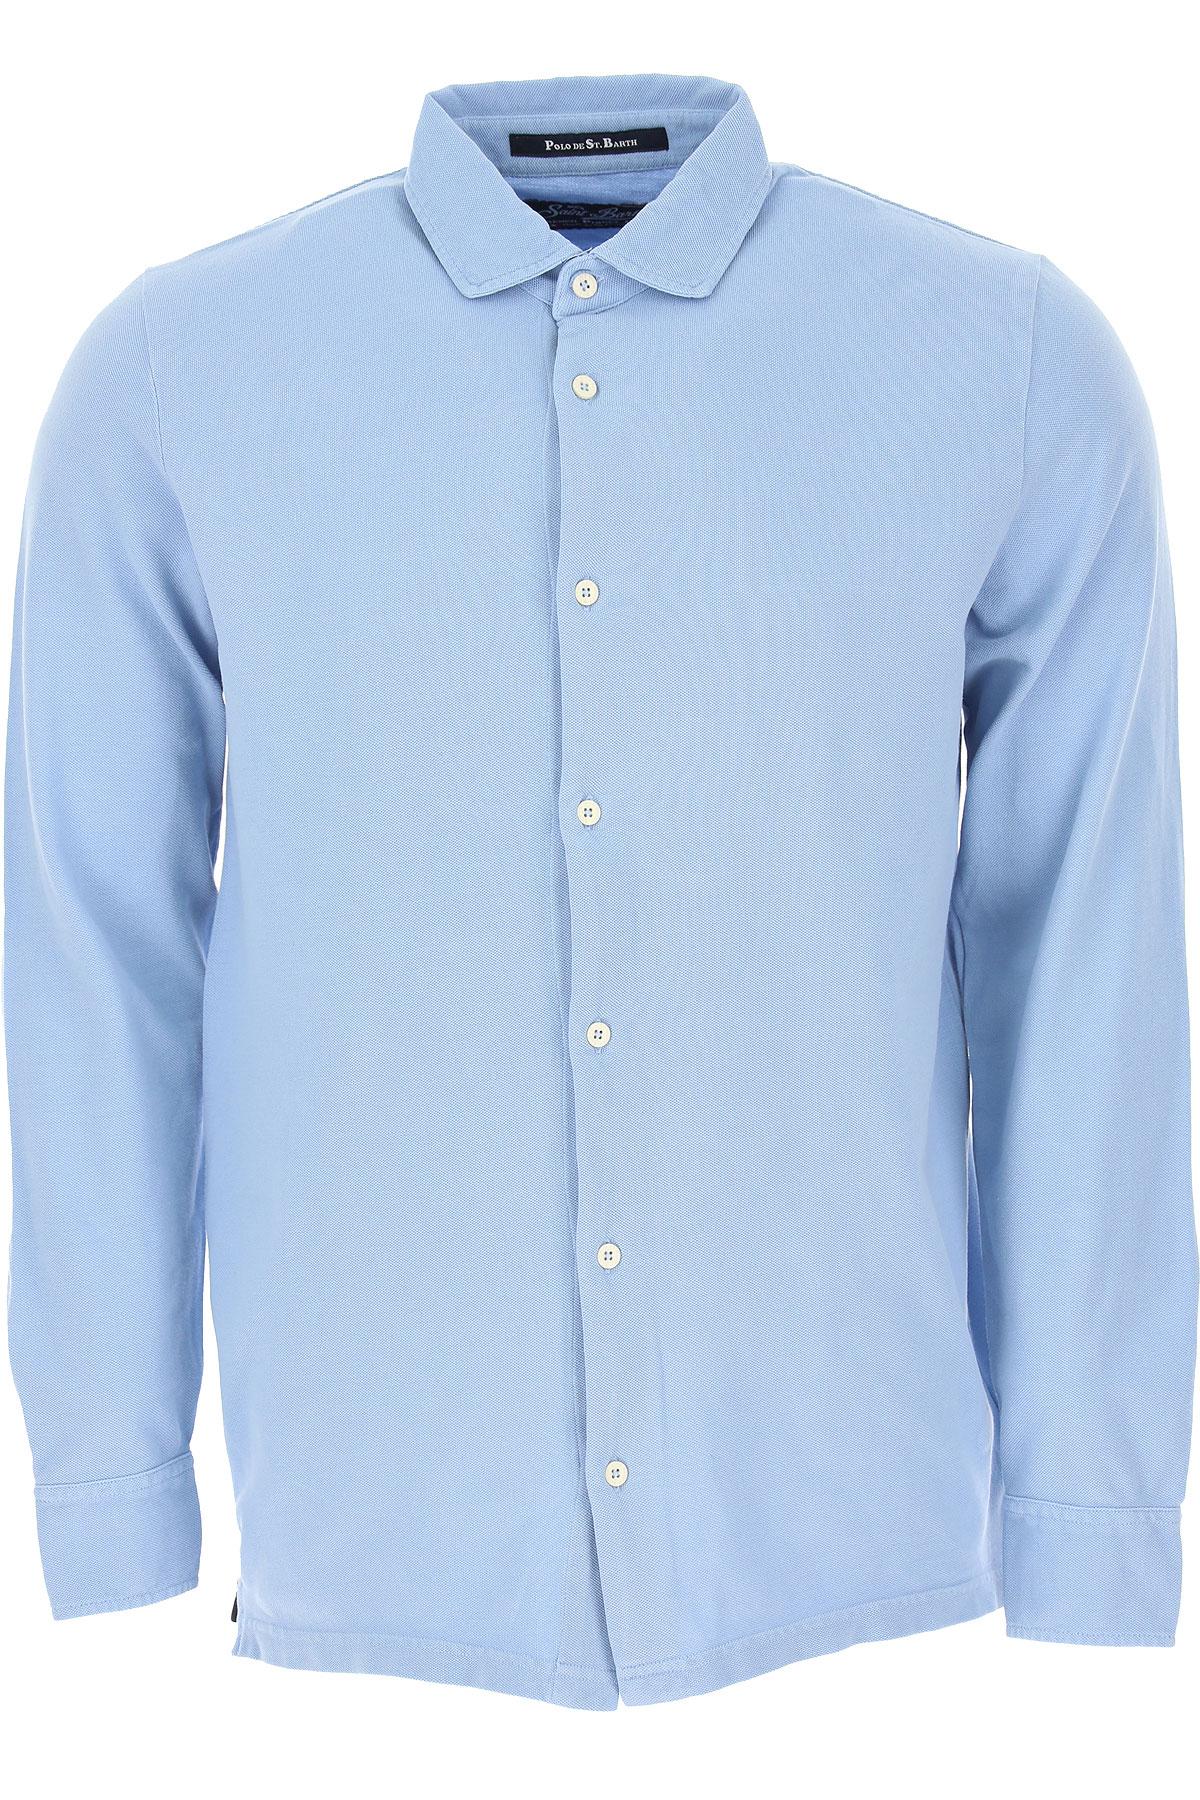 Mc2 Saint Barth Chemise Homme, Bleu clair, Coton, 2019, S XXL